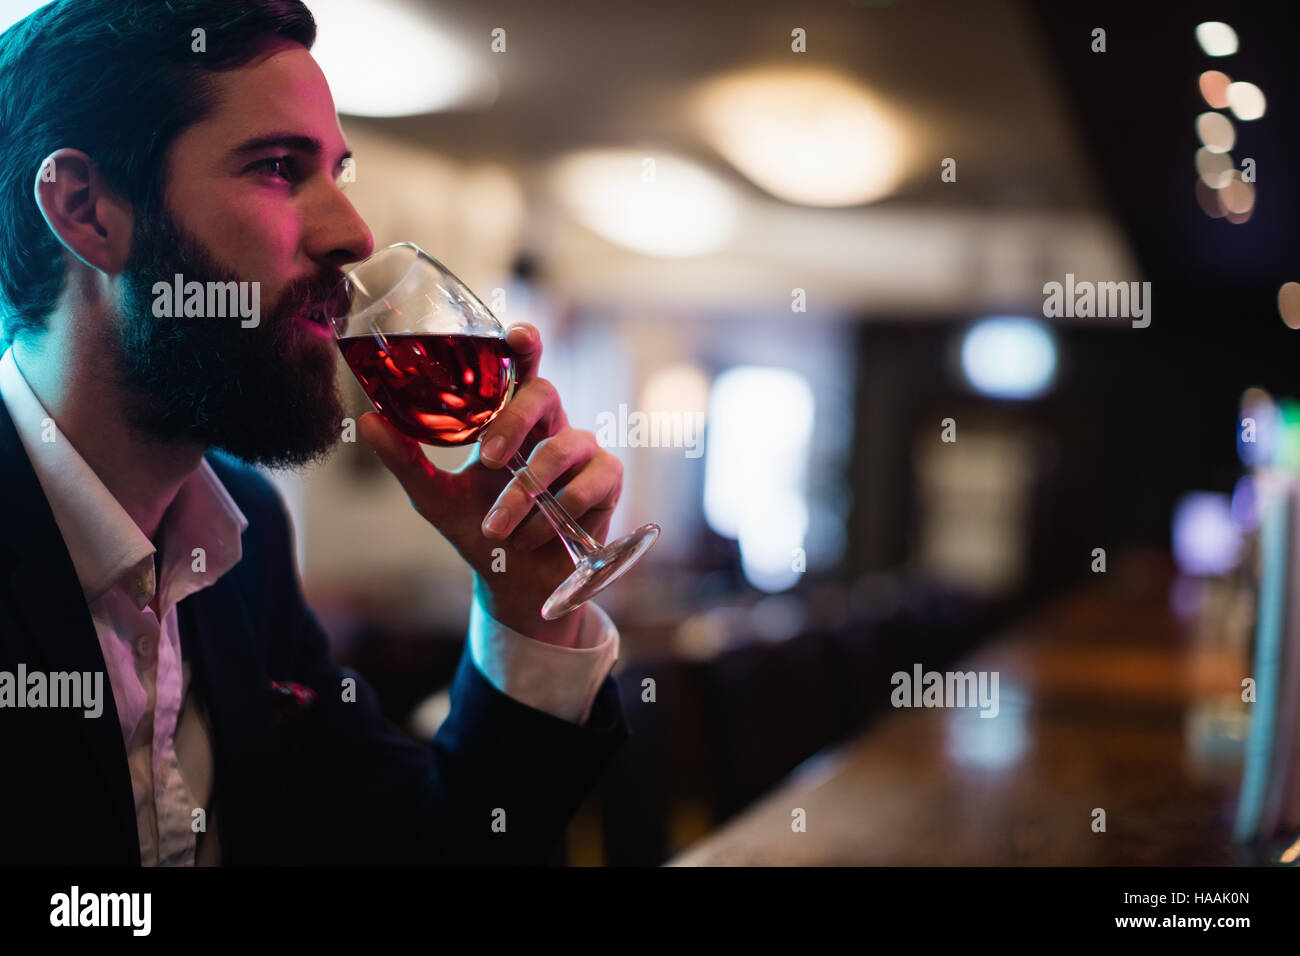 Businessman Hotel Bar Stockfotos & Businessman Hotel Bar Bilder - Alamy